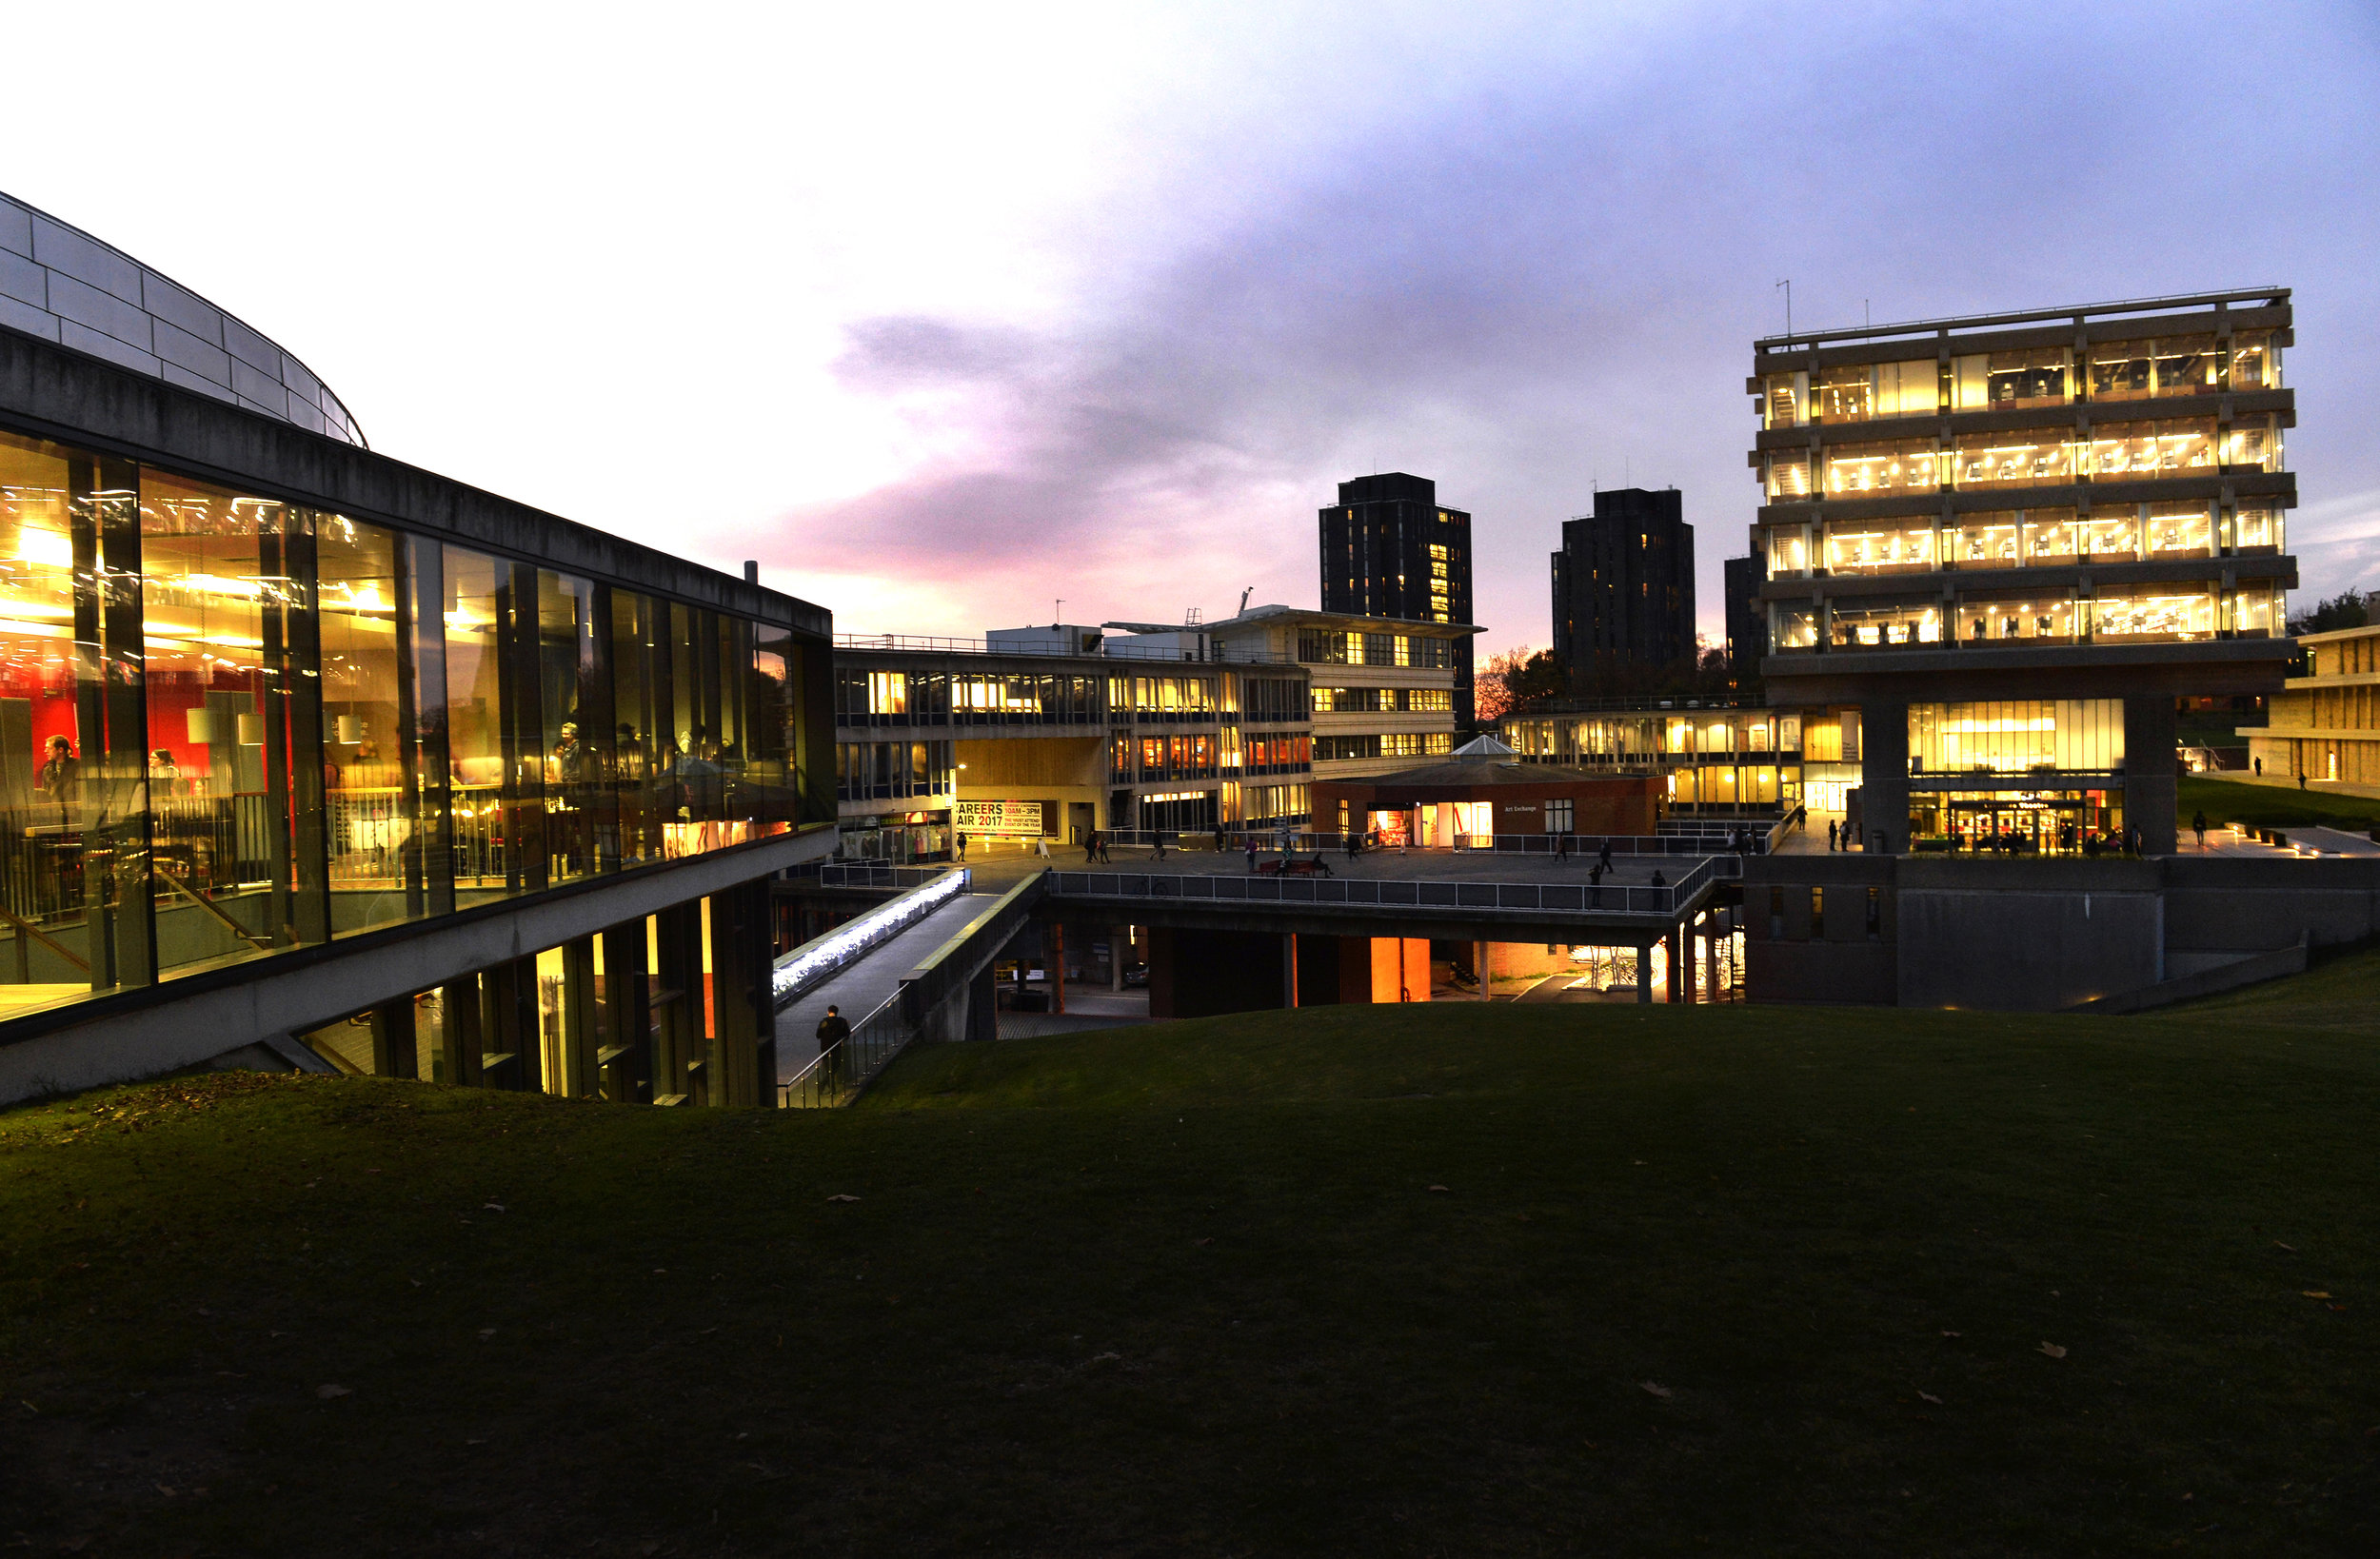 essex university.JPG